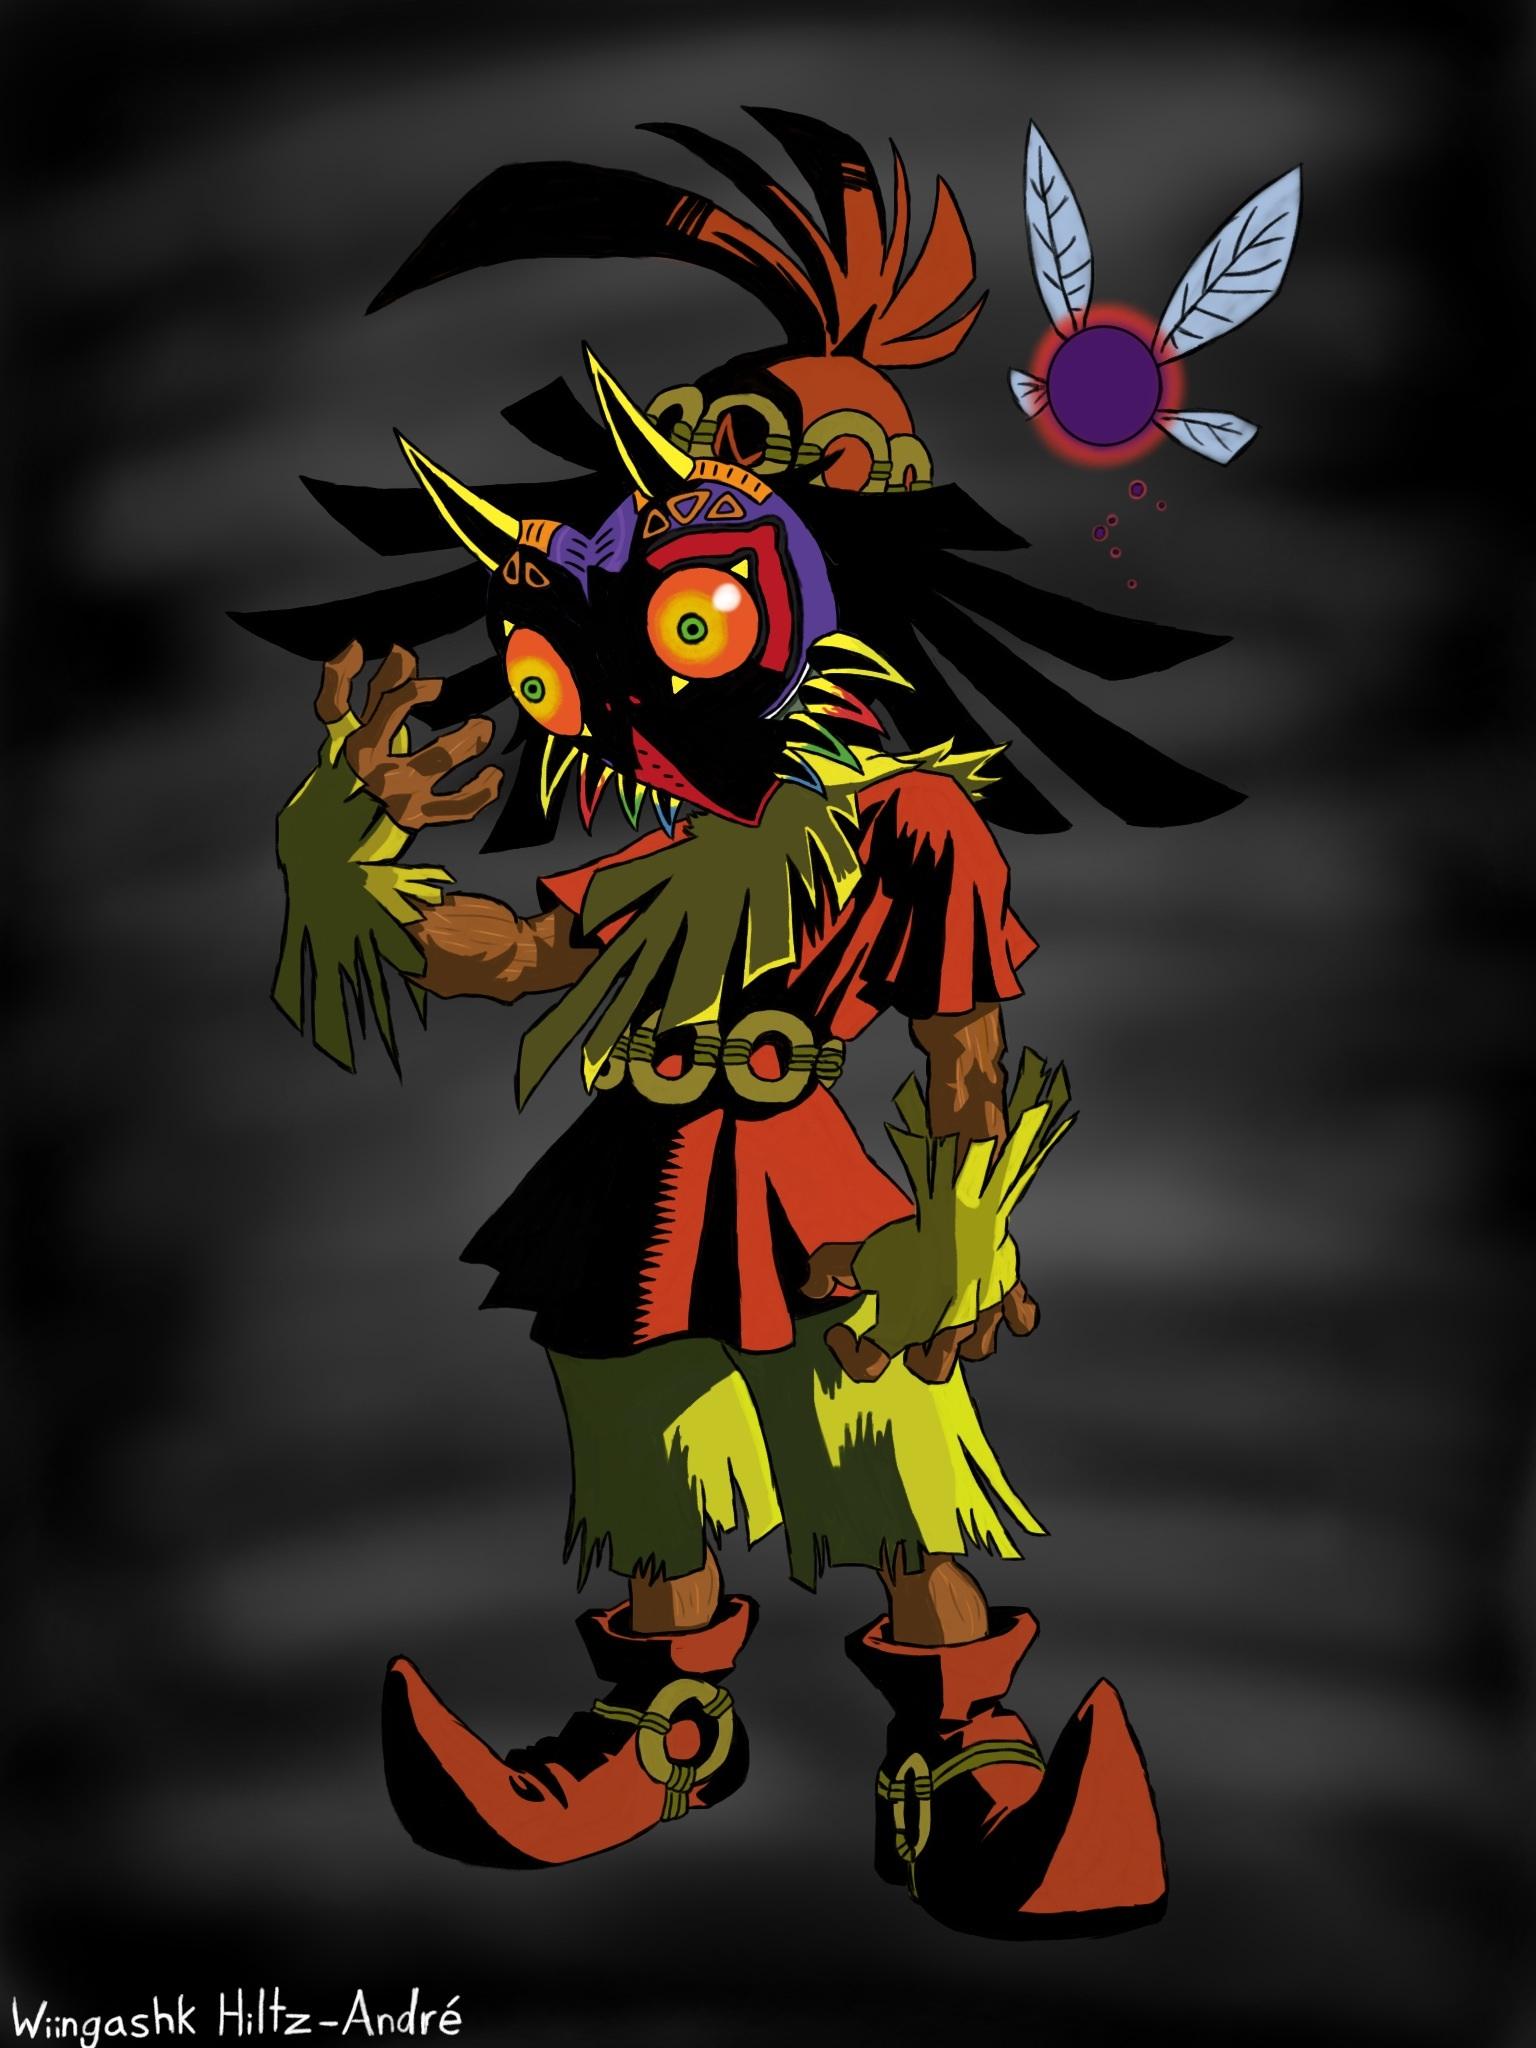 Zelda Majoras Mask Wallpaper Skull Kid Majoras mask s 1536x2048